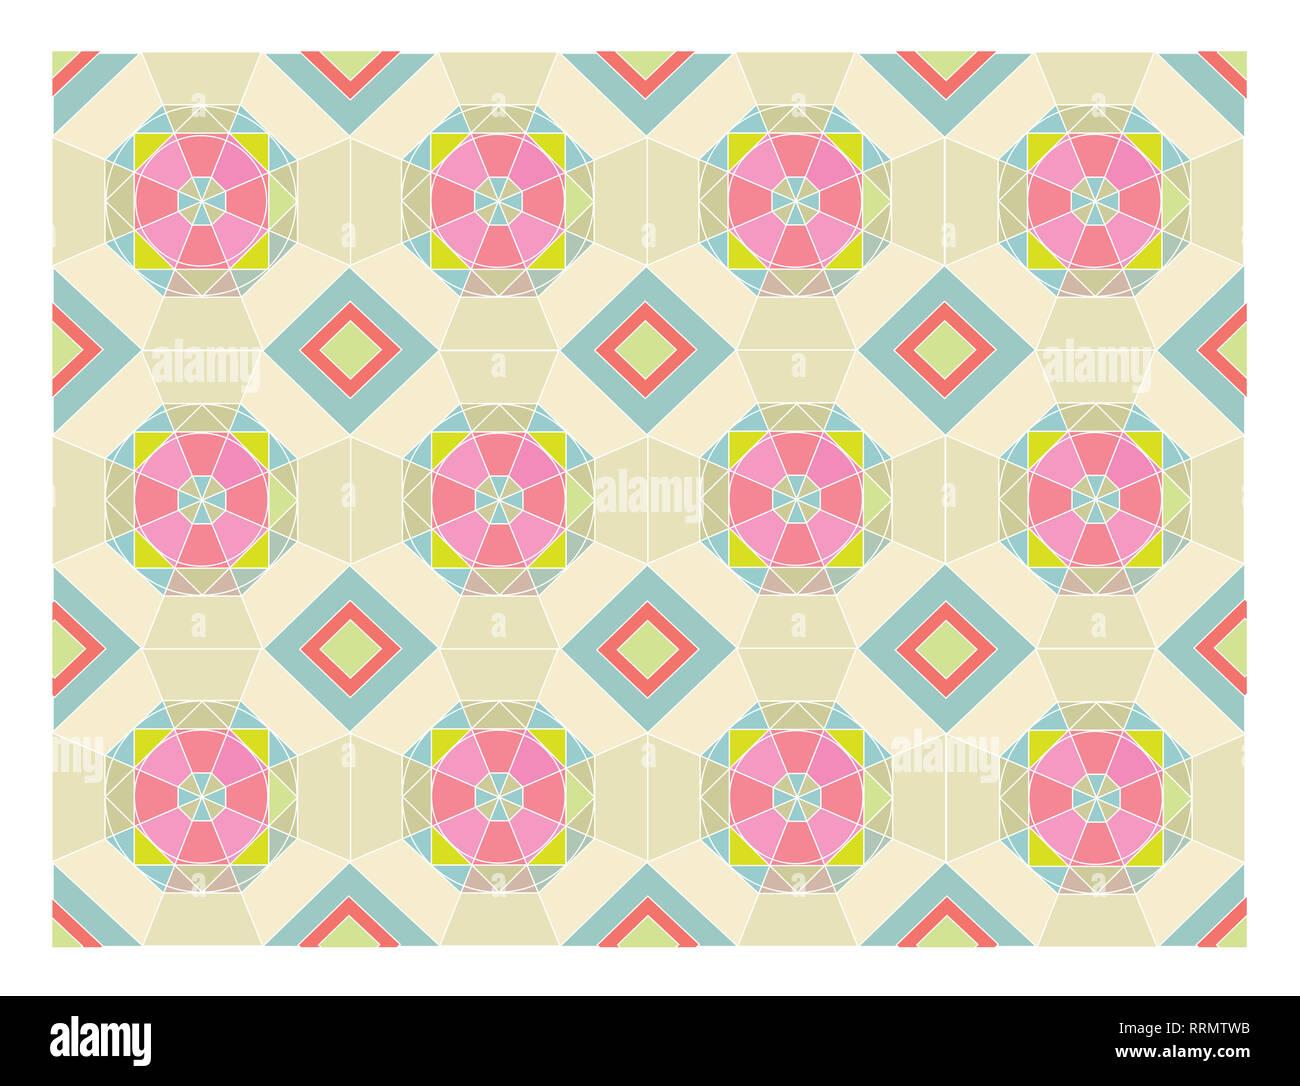 Hexagon Muster mit hellen Farben Stockbild